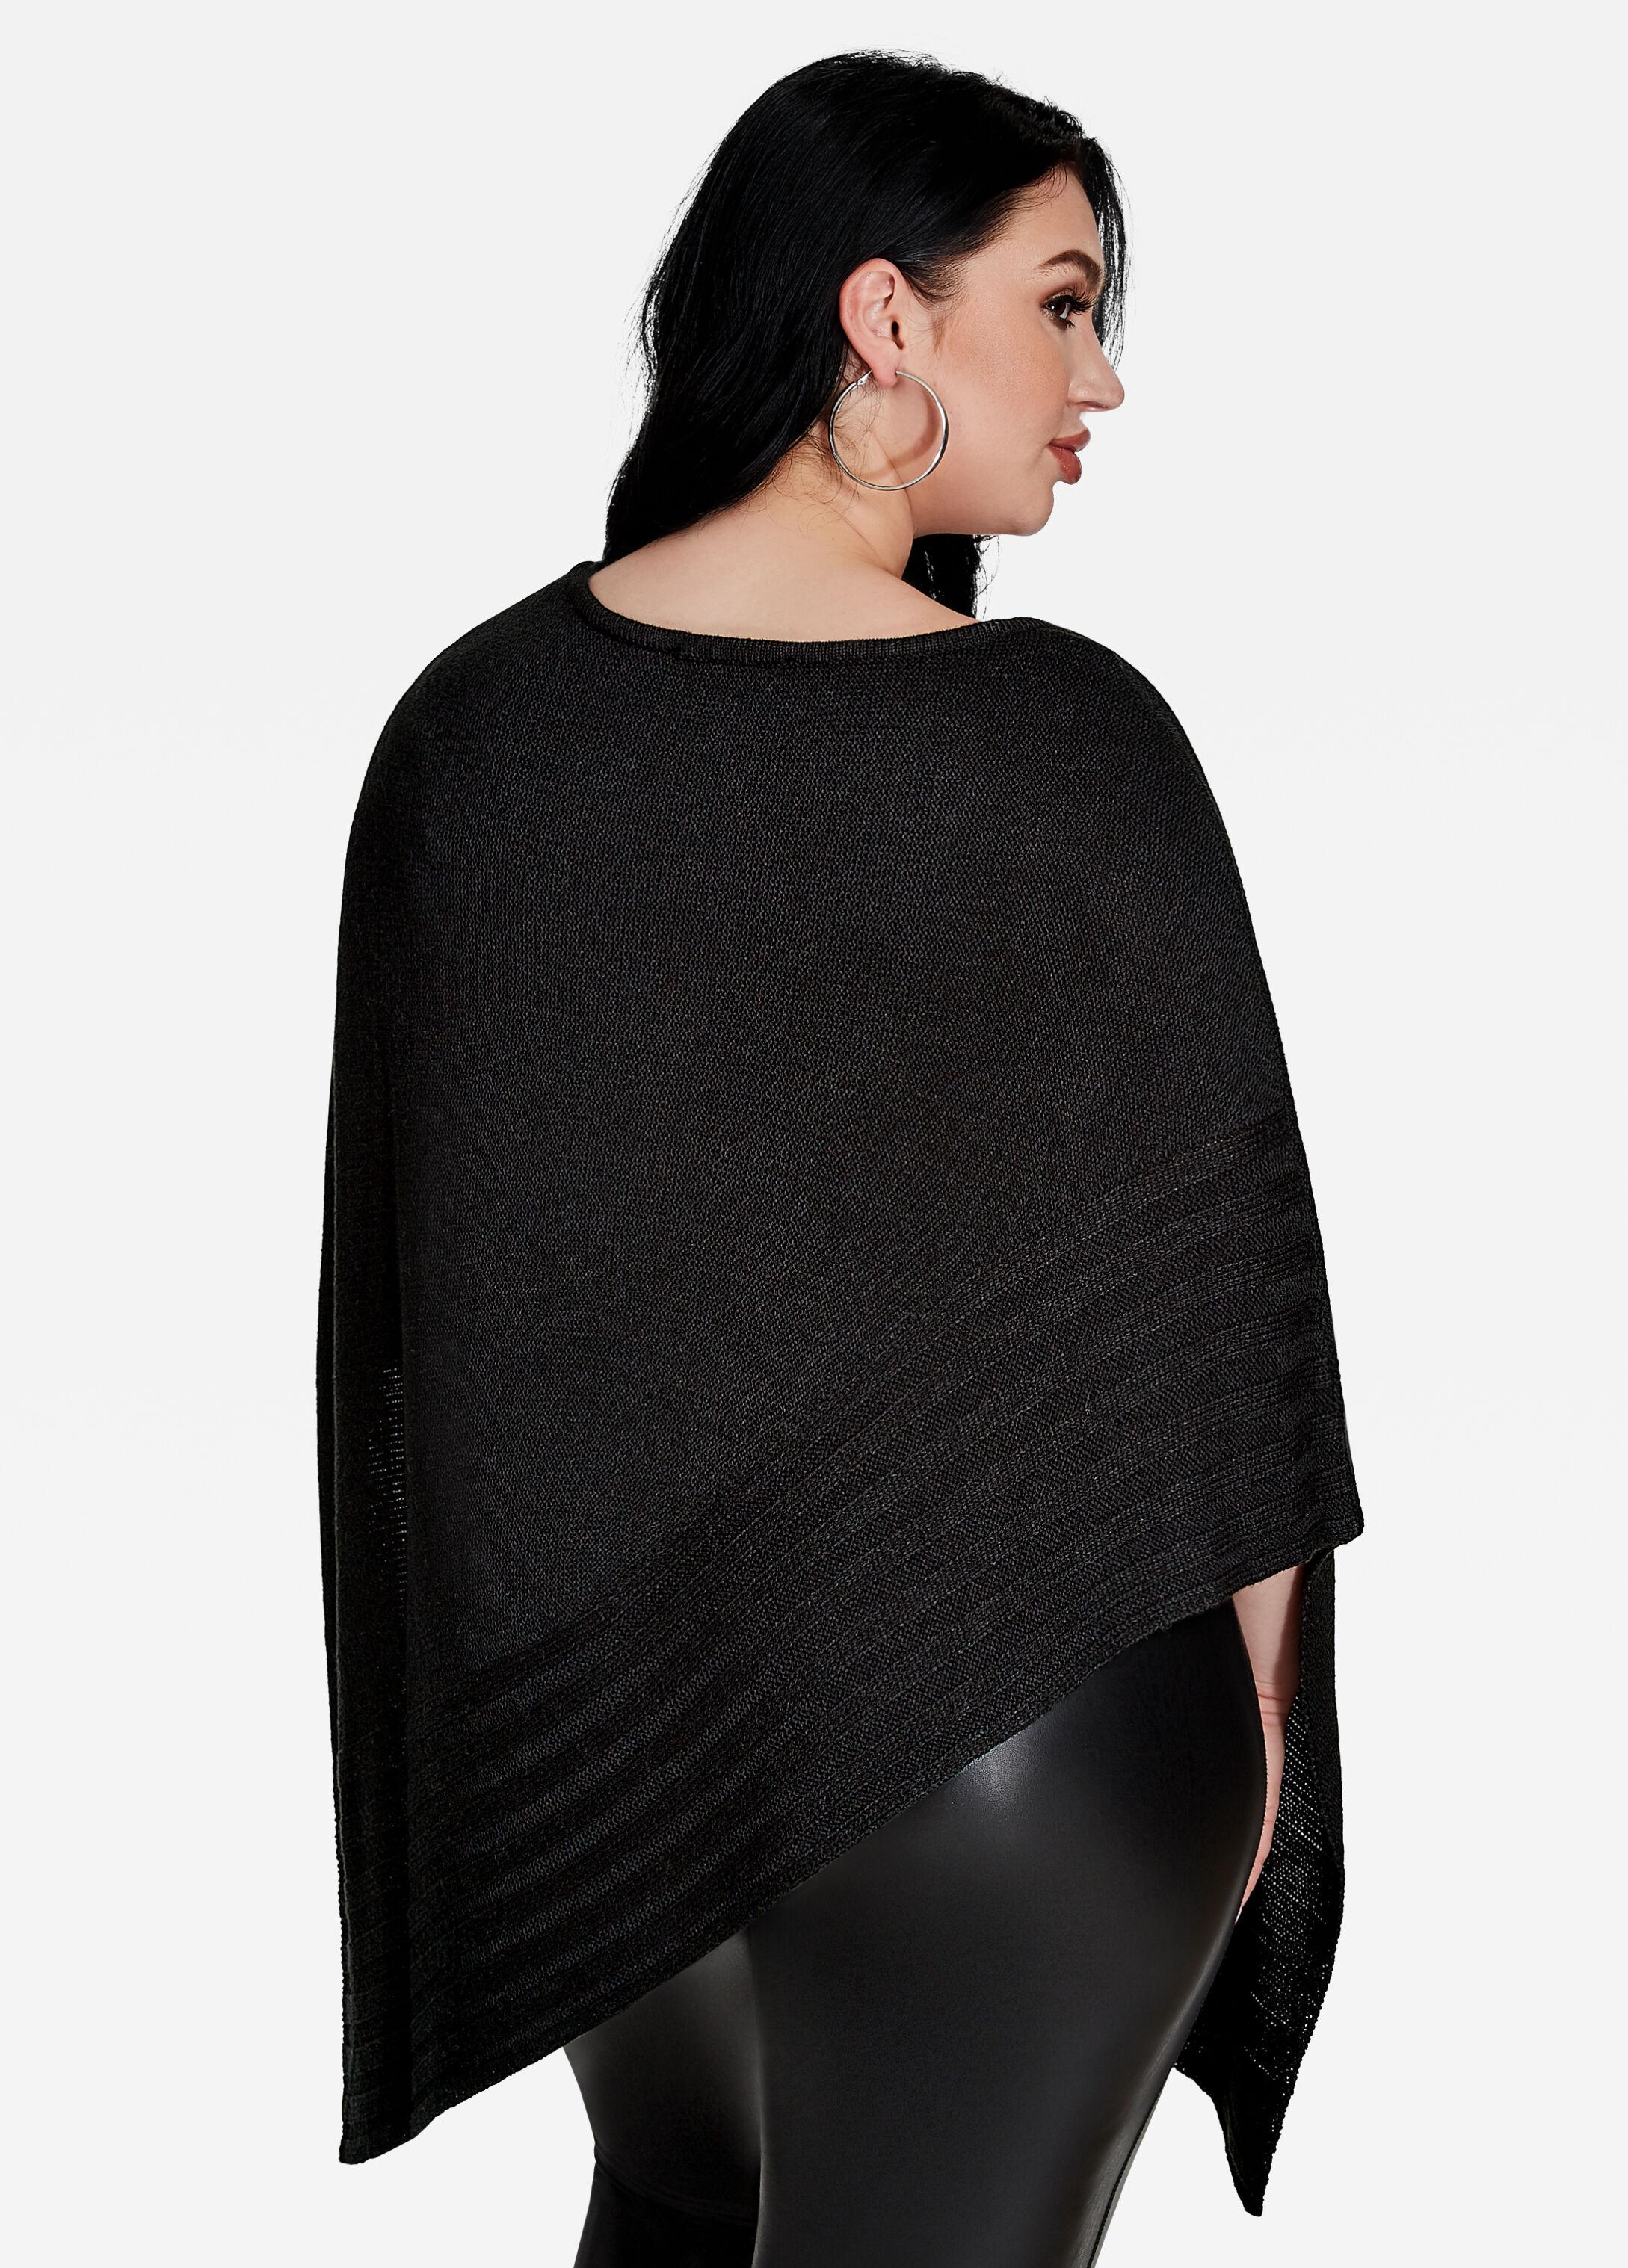 Buy Soft Knit Poncho Sweater Black - Sweaters